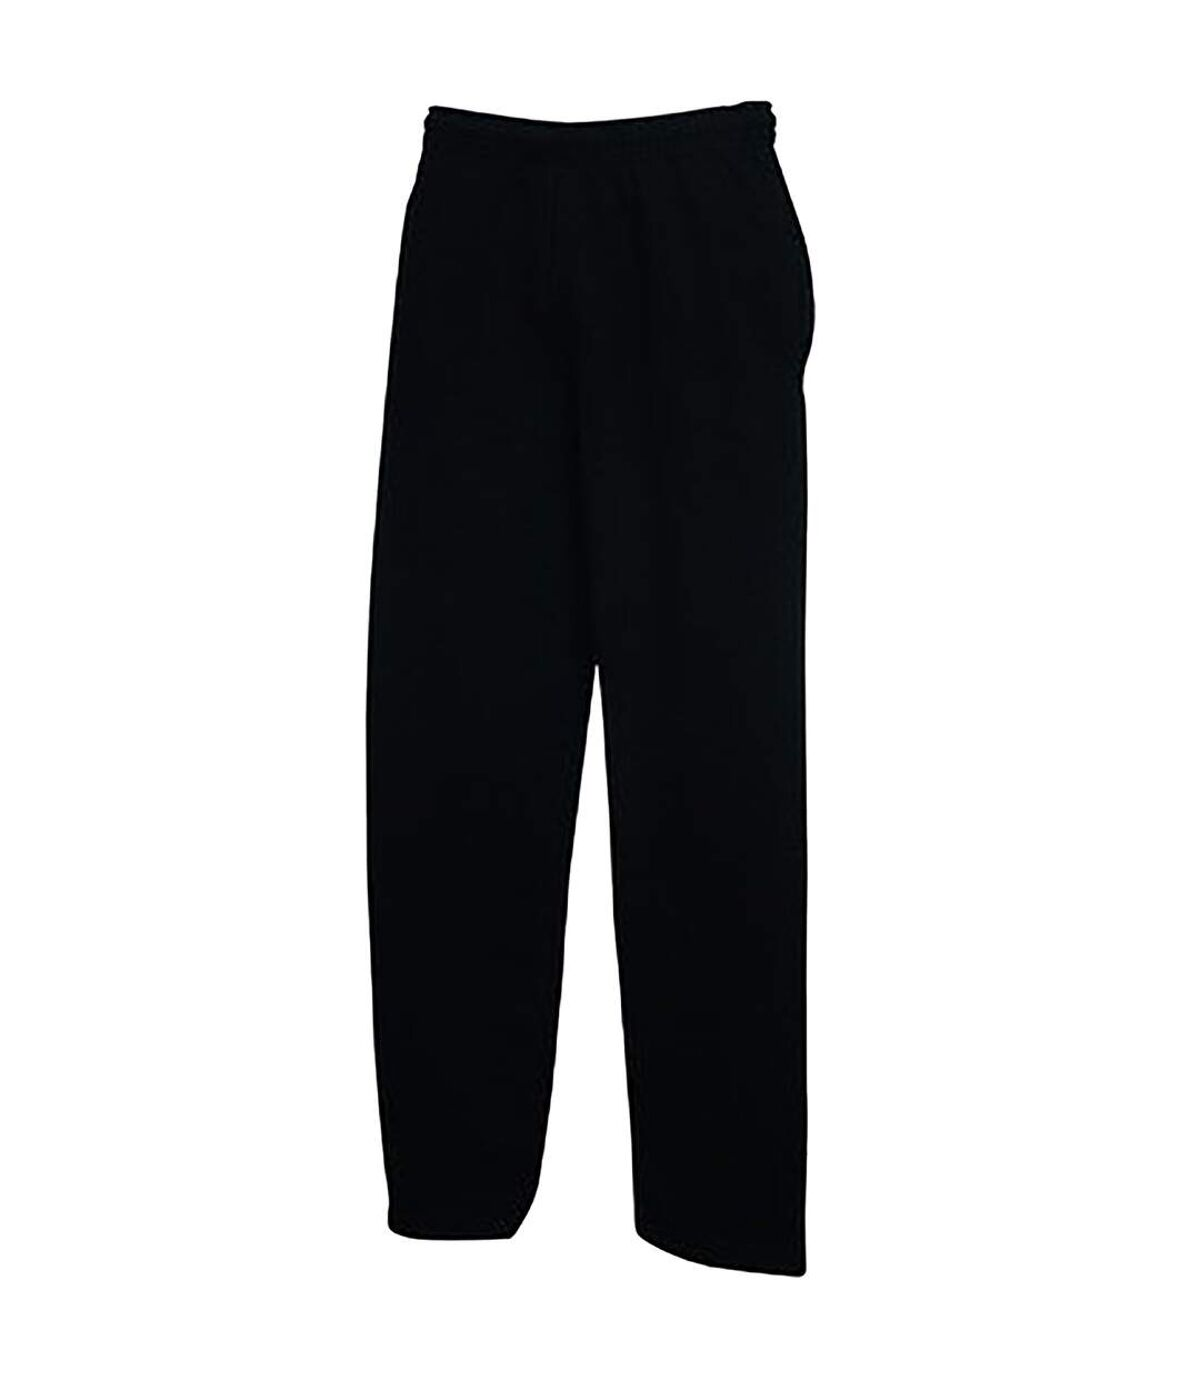 Fruit Of The Loom Mens Open Hem Jog Pants / Jogging Bottoms (Heather Grey) - UTBC396